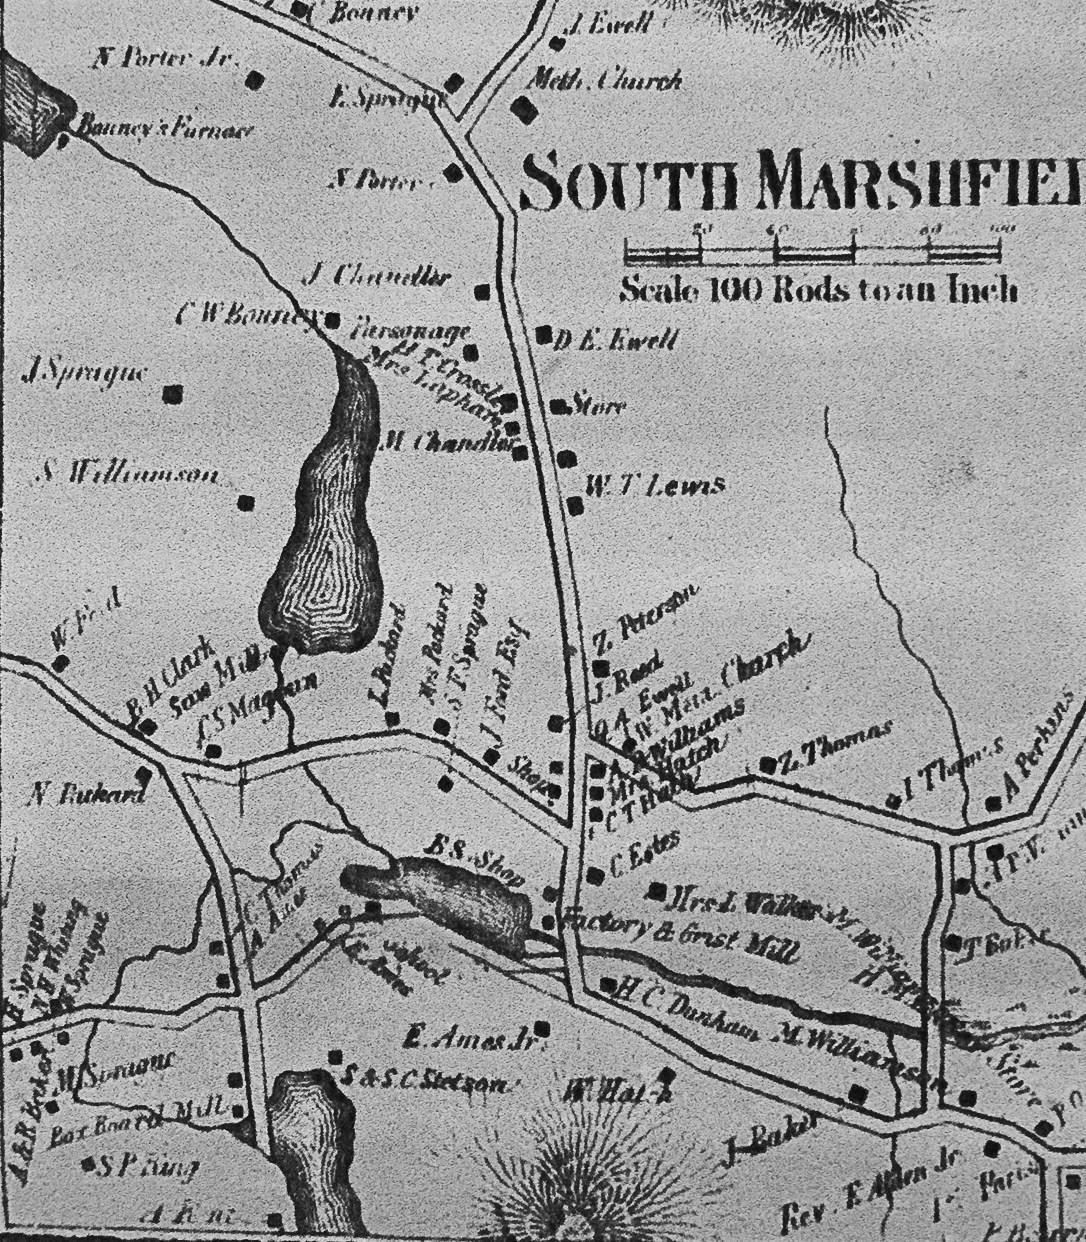 Swingers in north marshfield massachusetts Good looking swinger club kansas city.